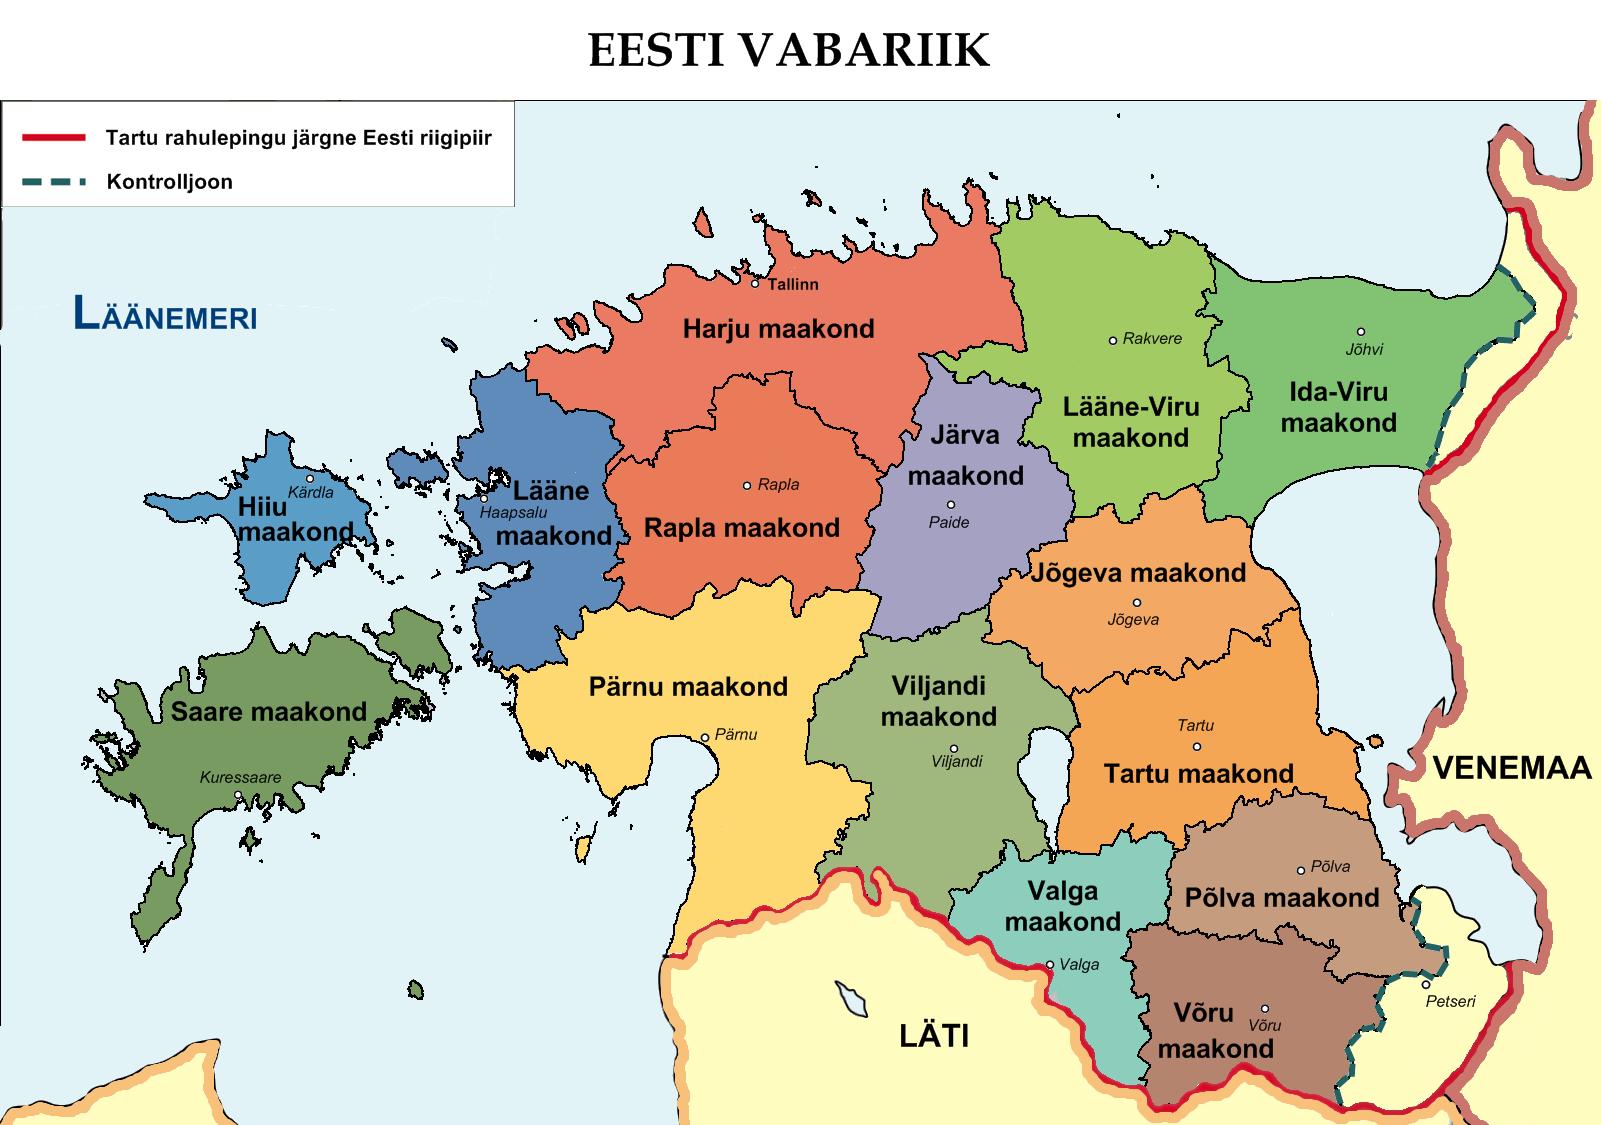 Eesti vabariik 1 гривна 2002 года цена украина цена